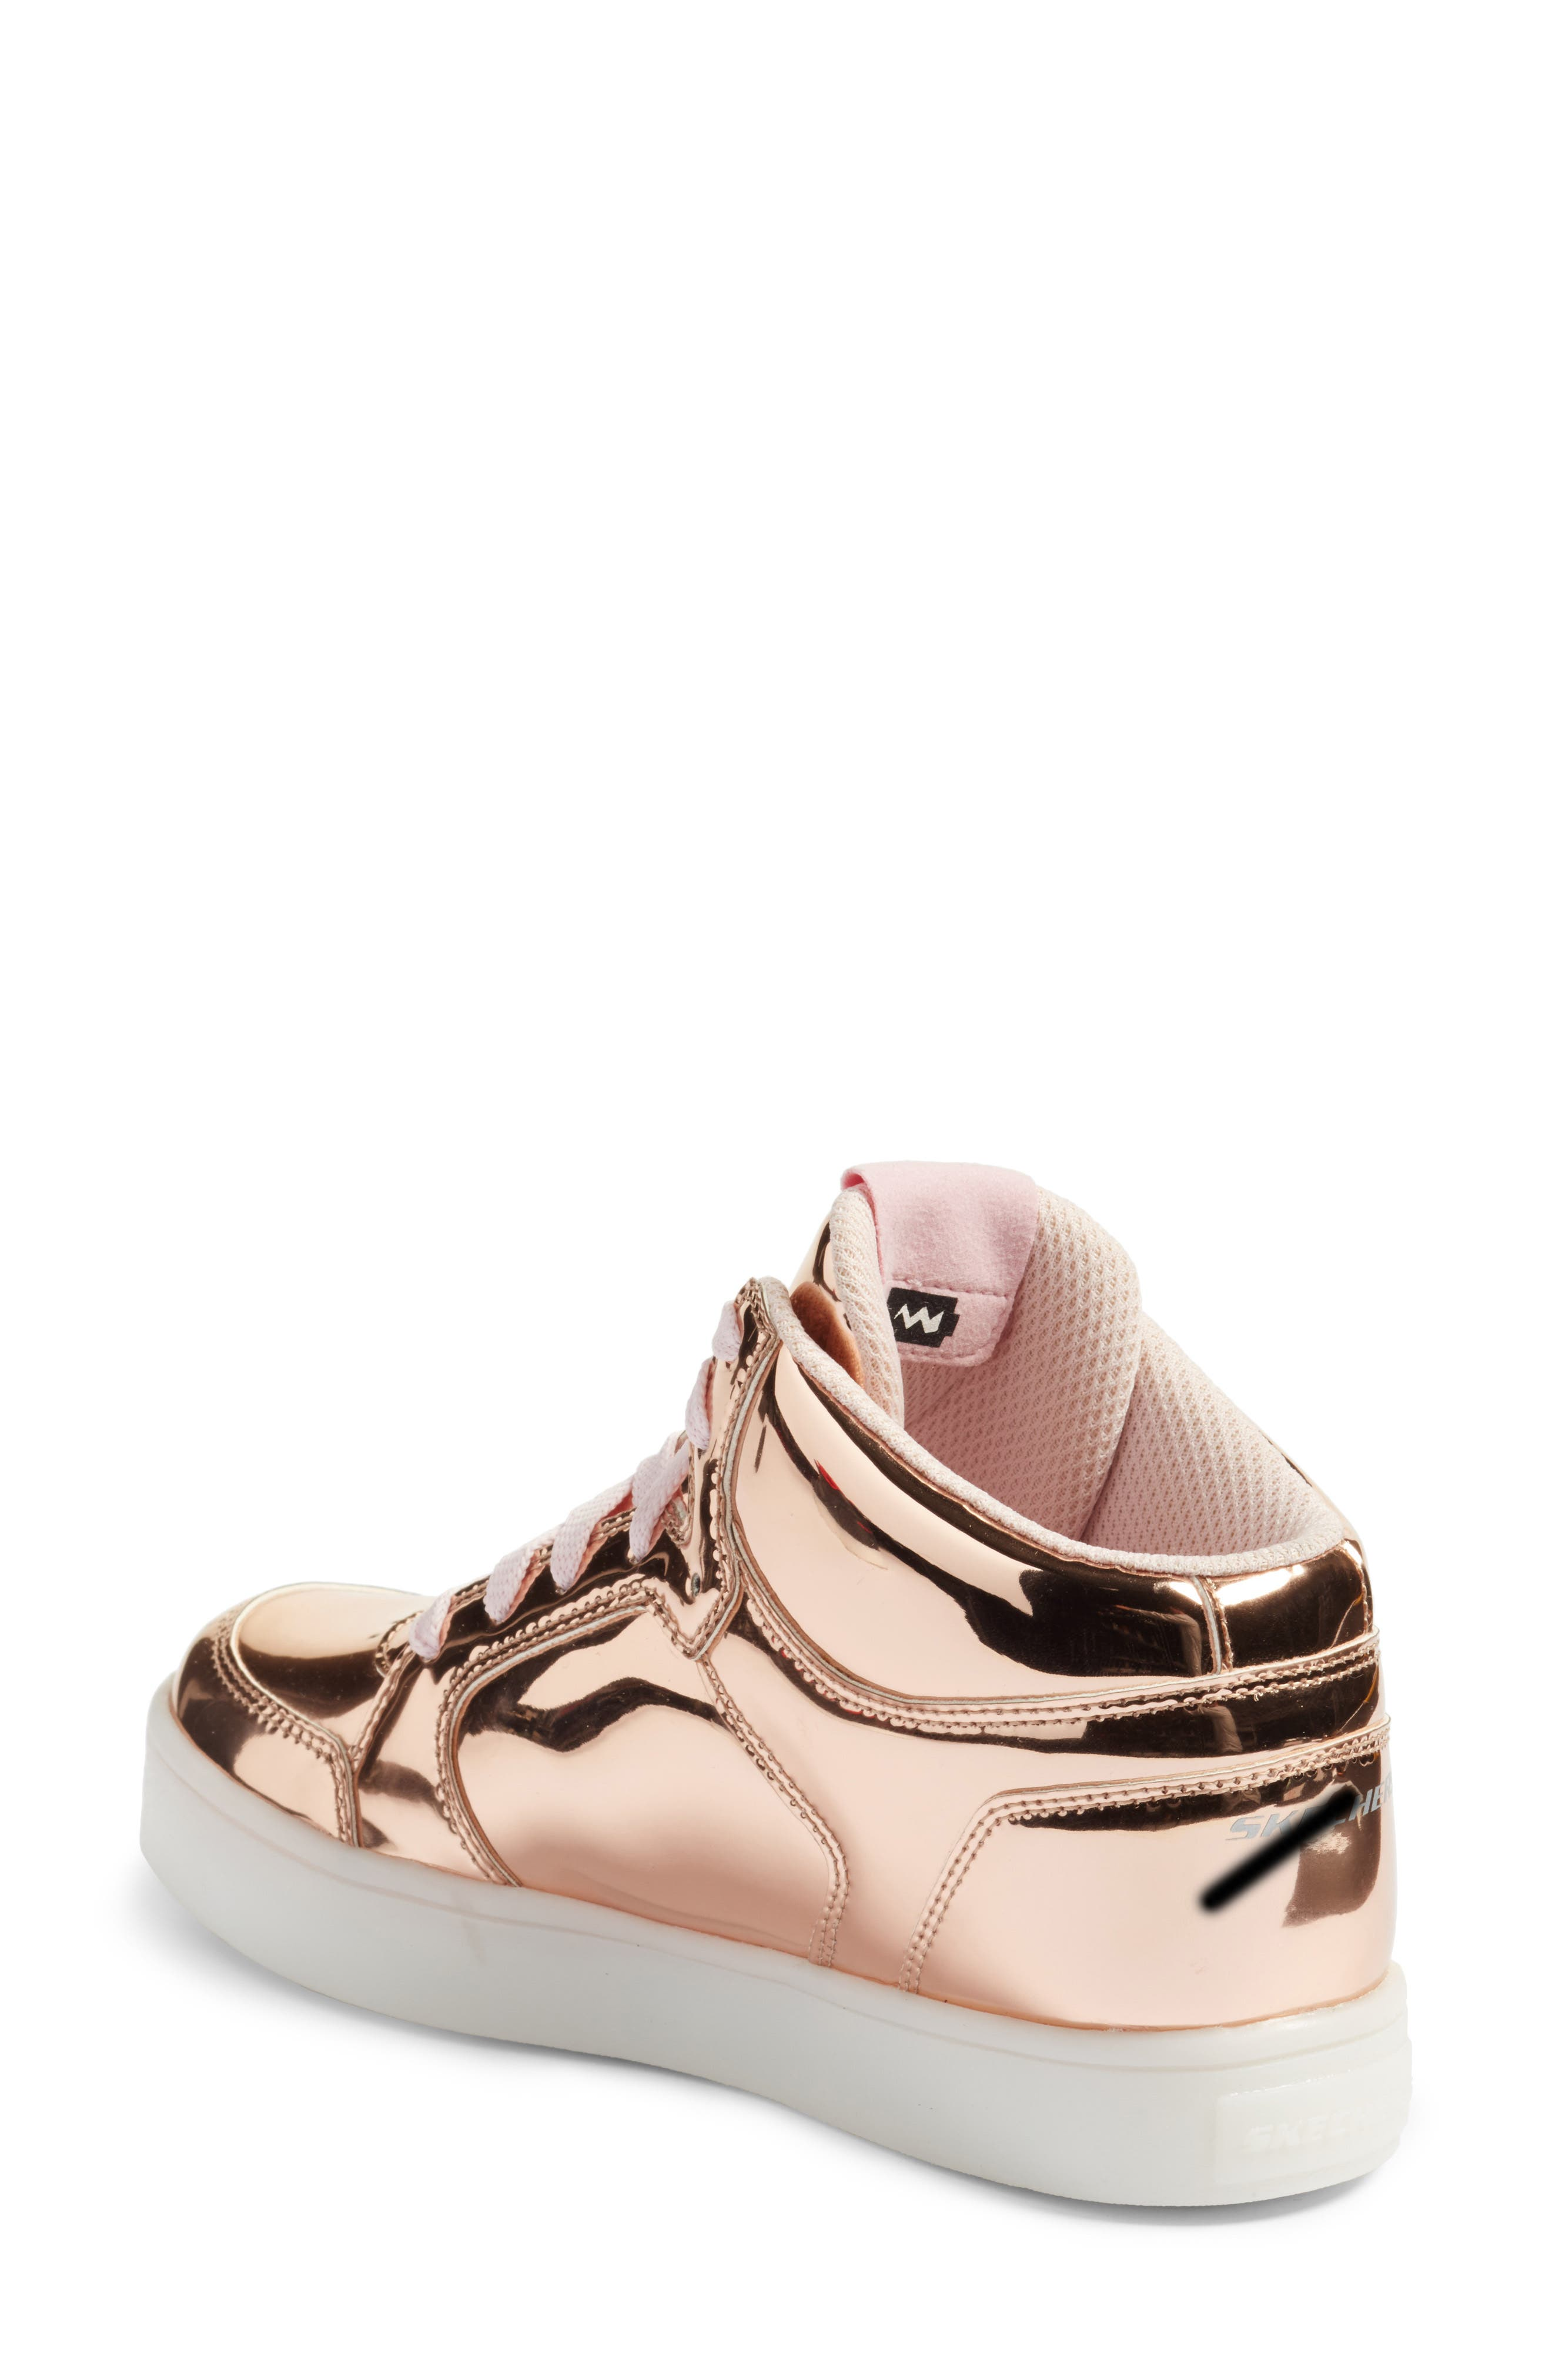 Energy Lights Metallic High Top Sneaker,                             Alternate thumbnail 2, color,                             Rose Gold